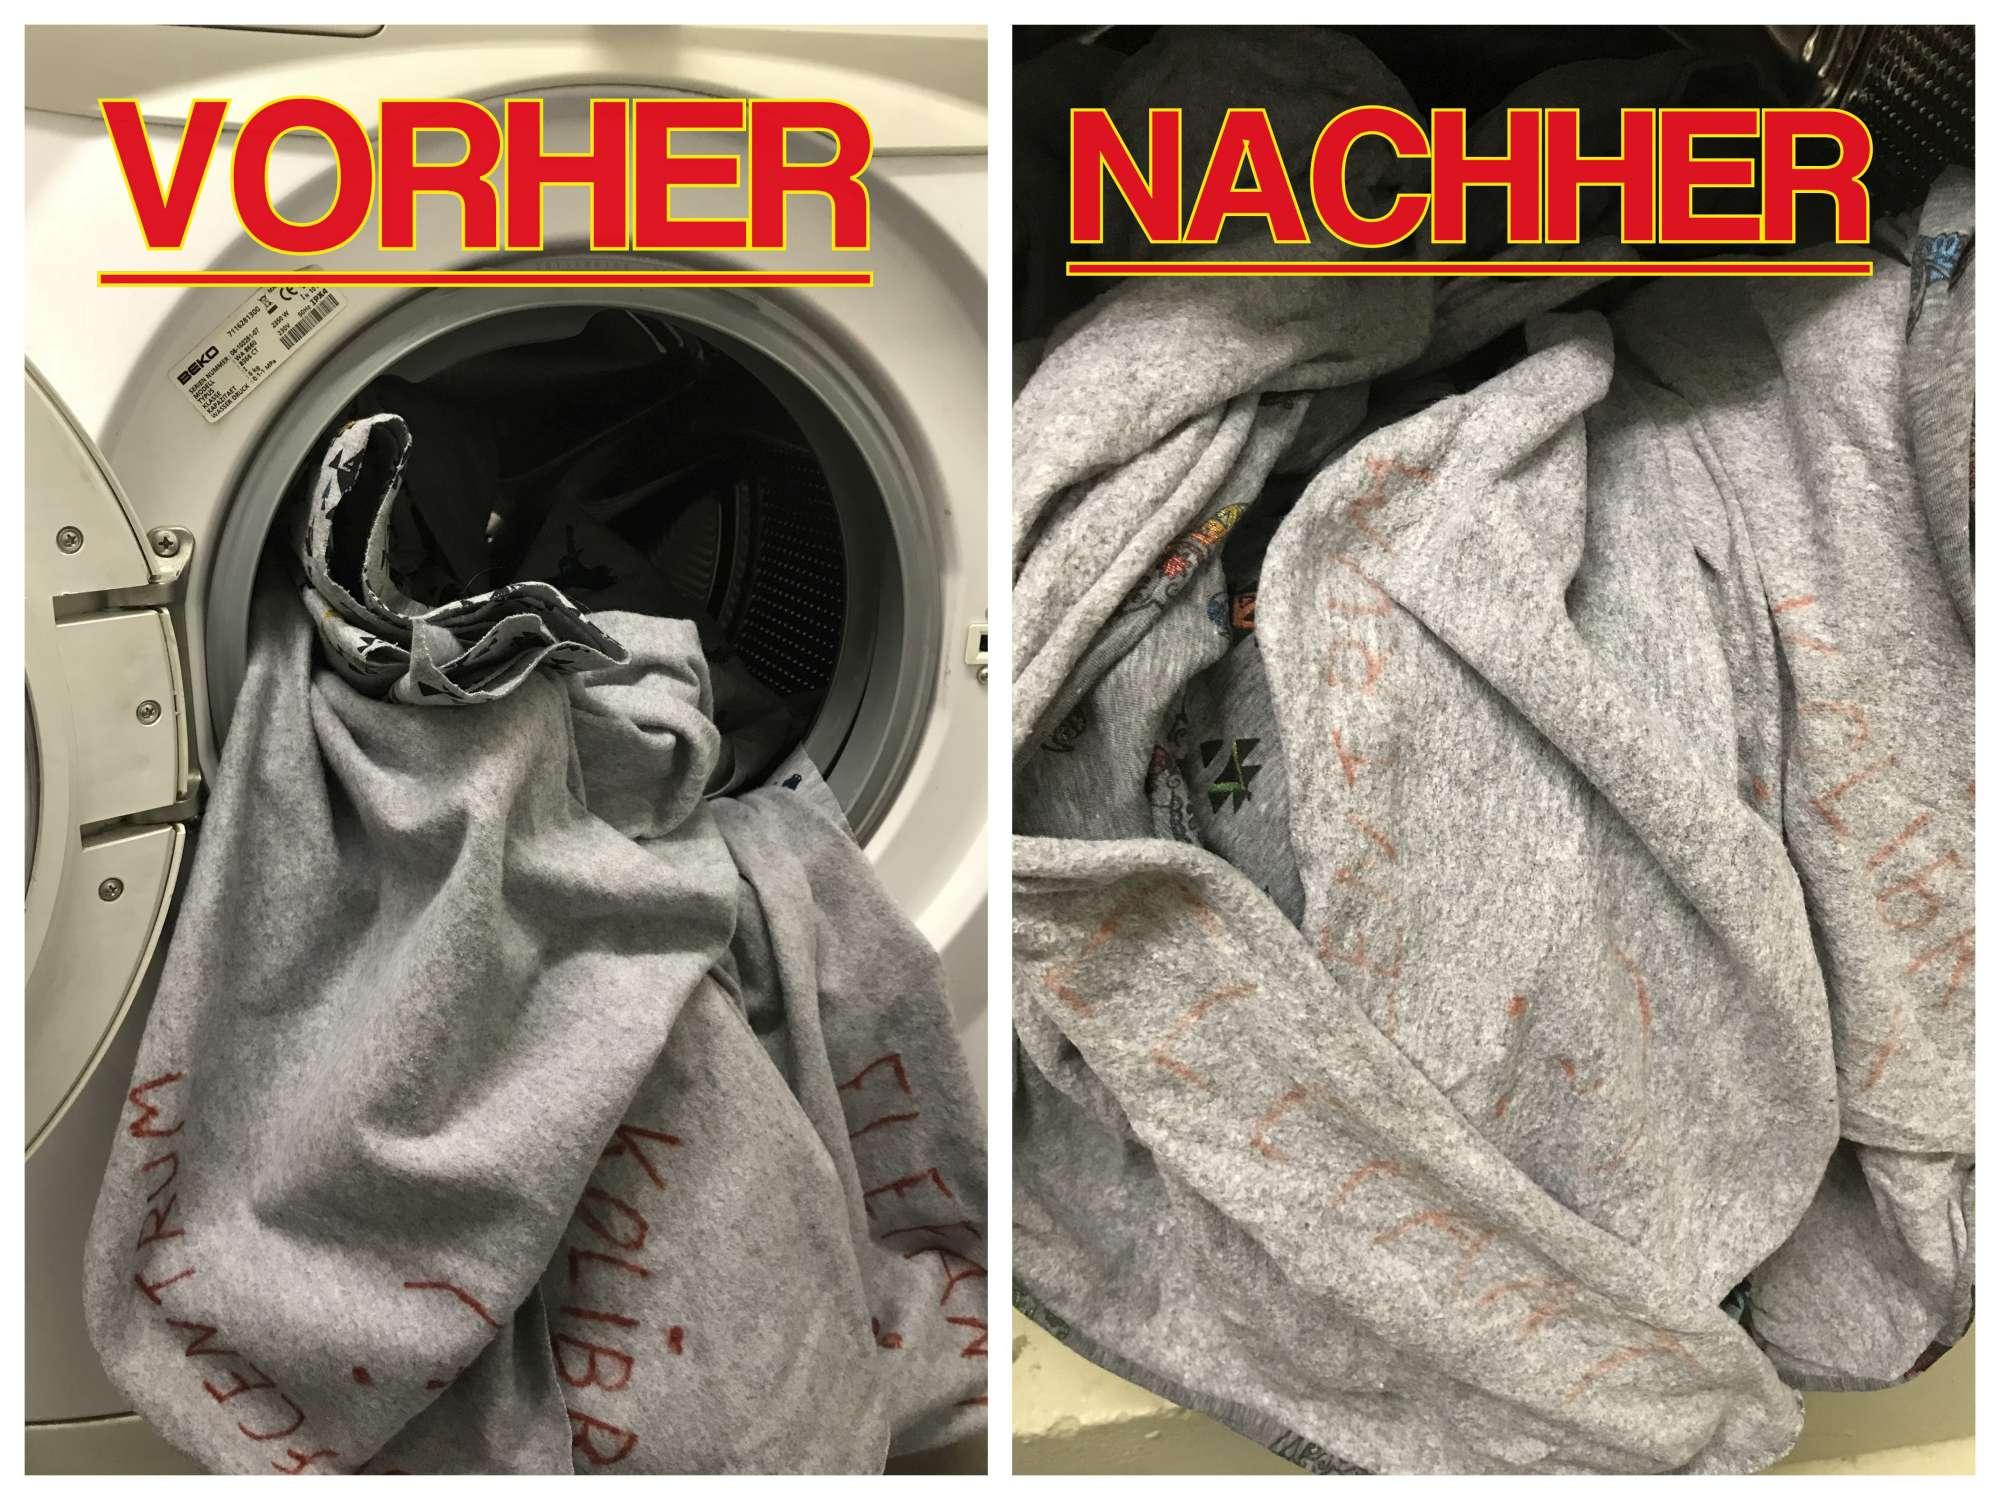 Neuer-Ordner3-2000